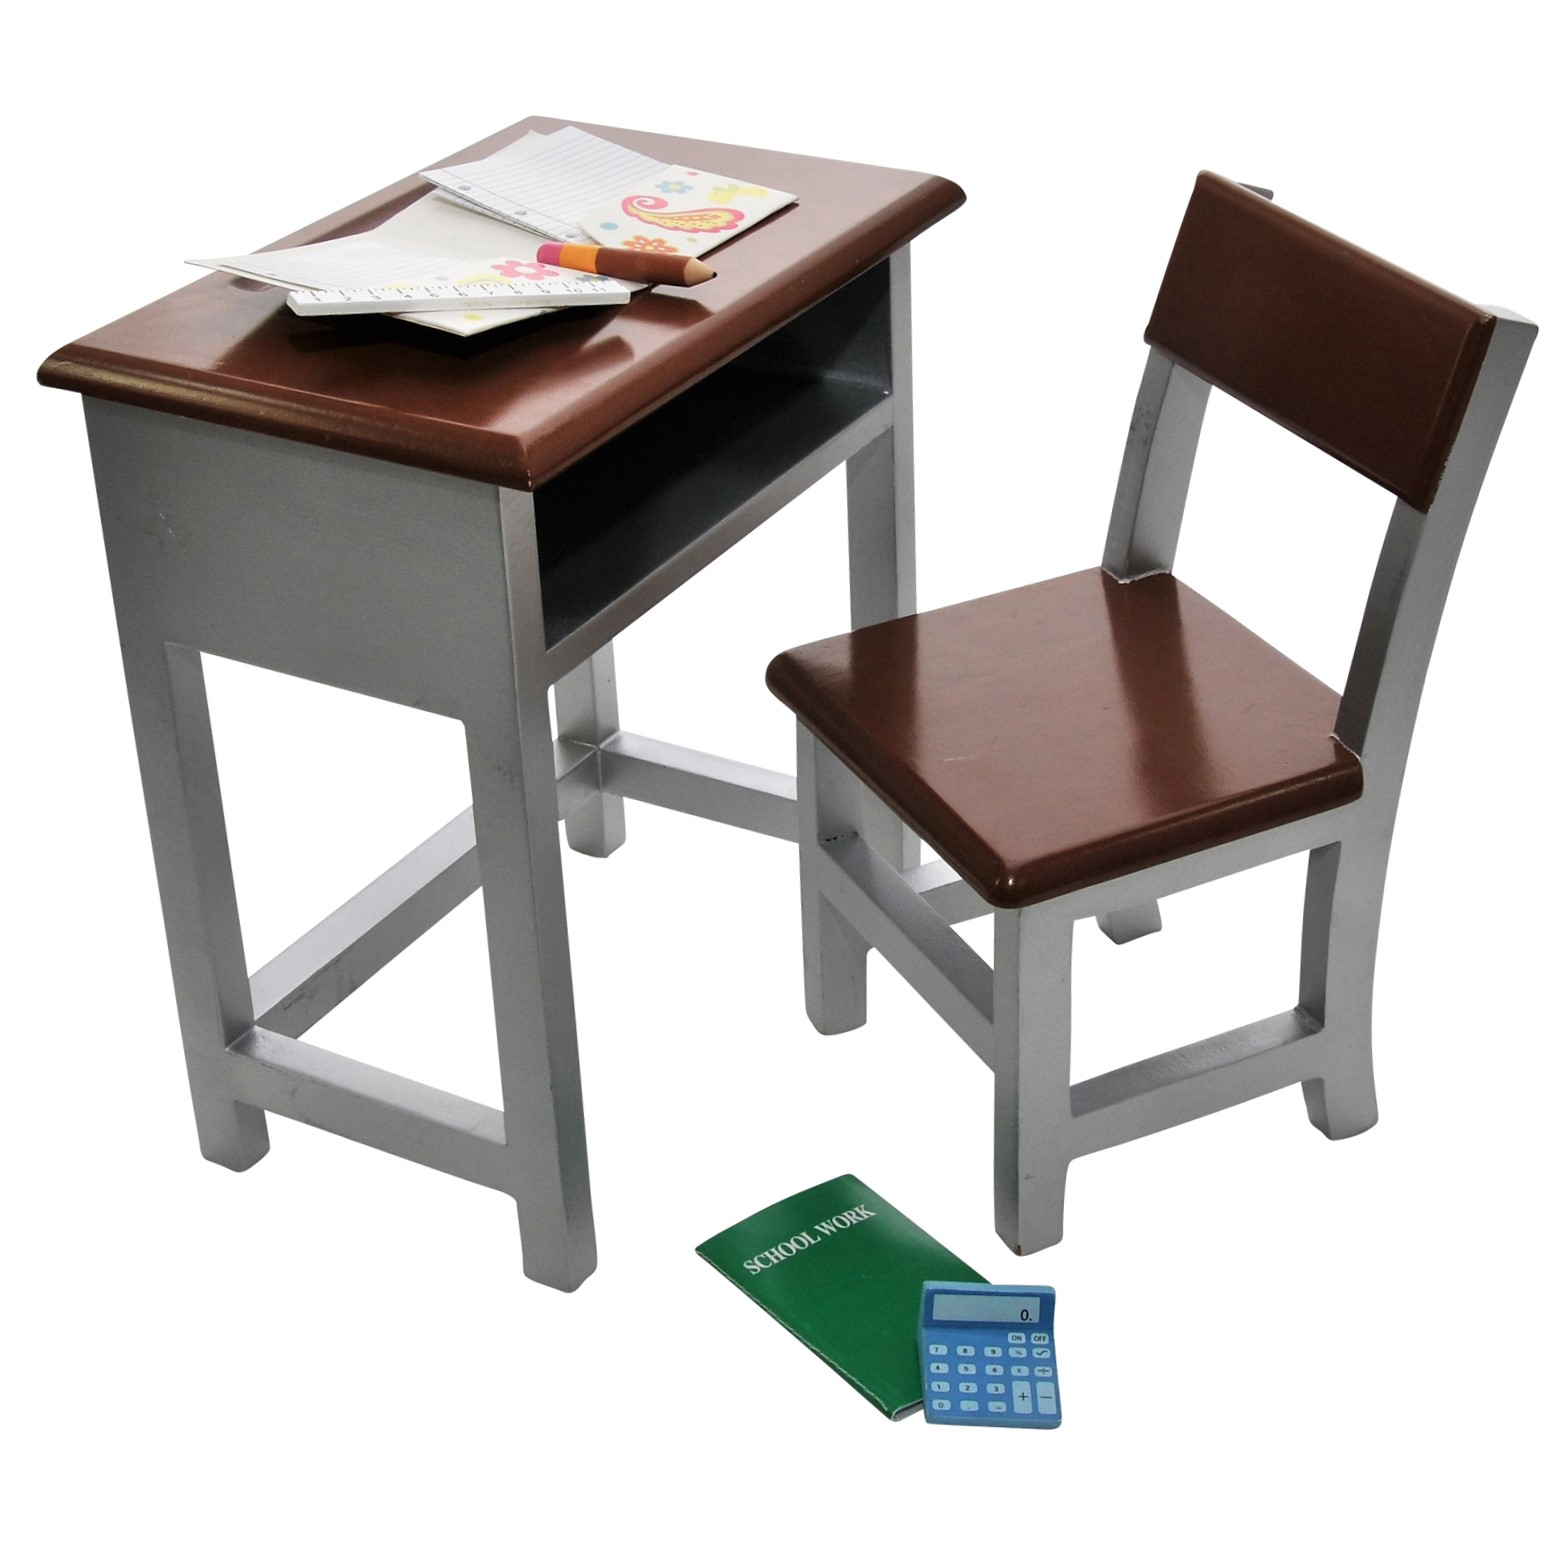 wood chair accessories revolving net the queen 39s treasures wooden modern school desk and